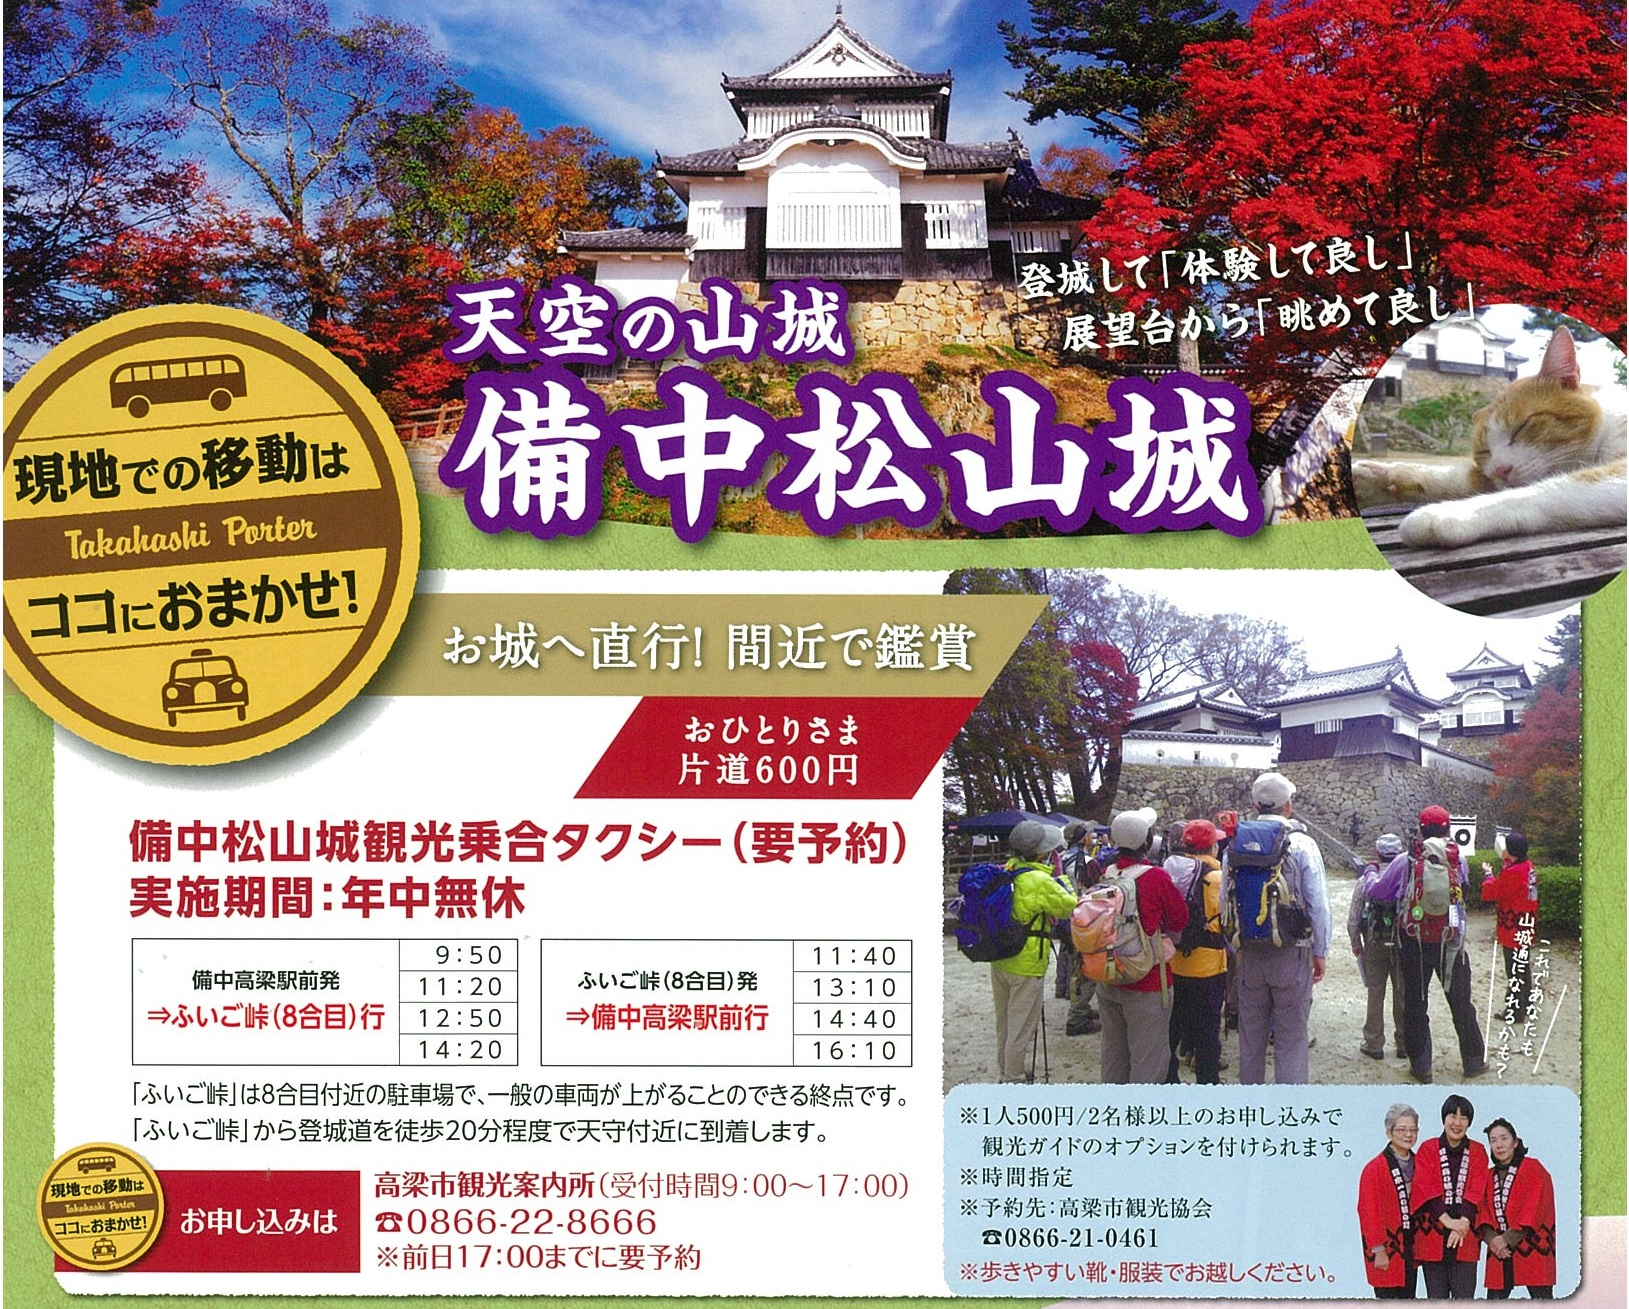 http://takahasikanko.or.jp/uploads/fckeditor/uid000001_201909302230289601bc63.jpg